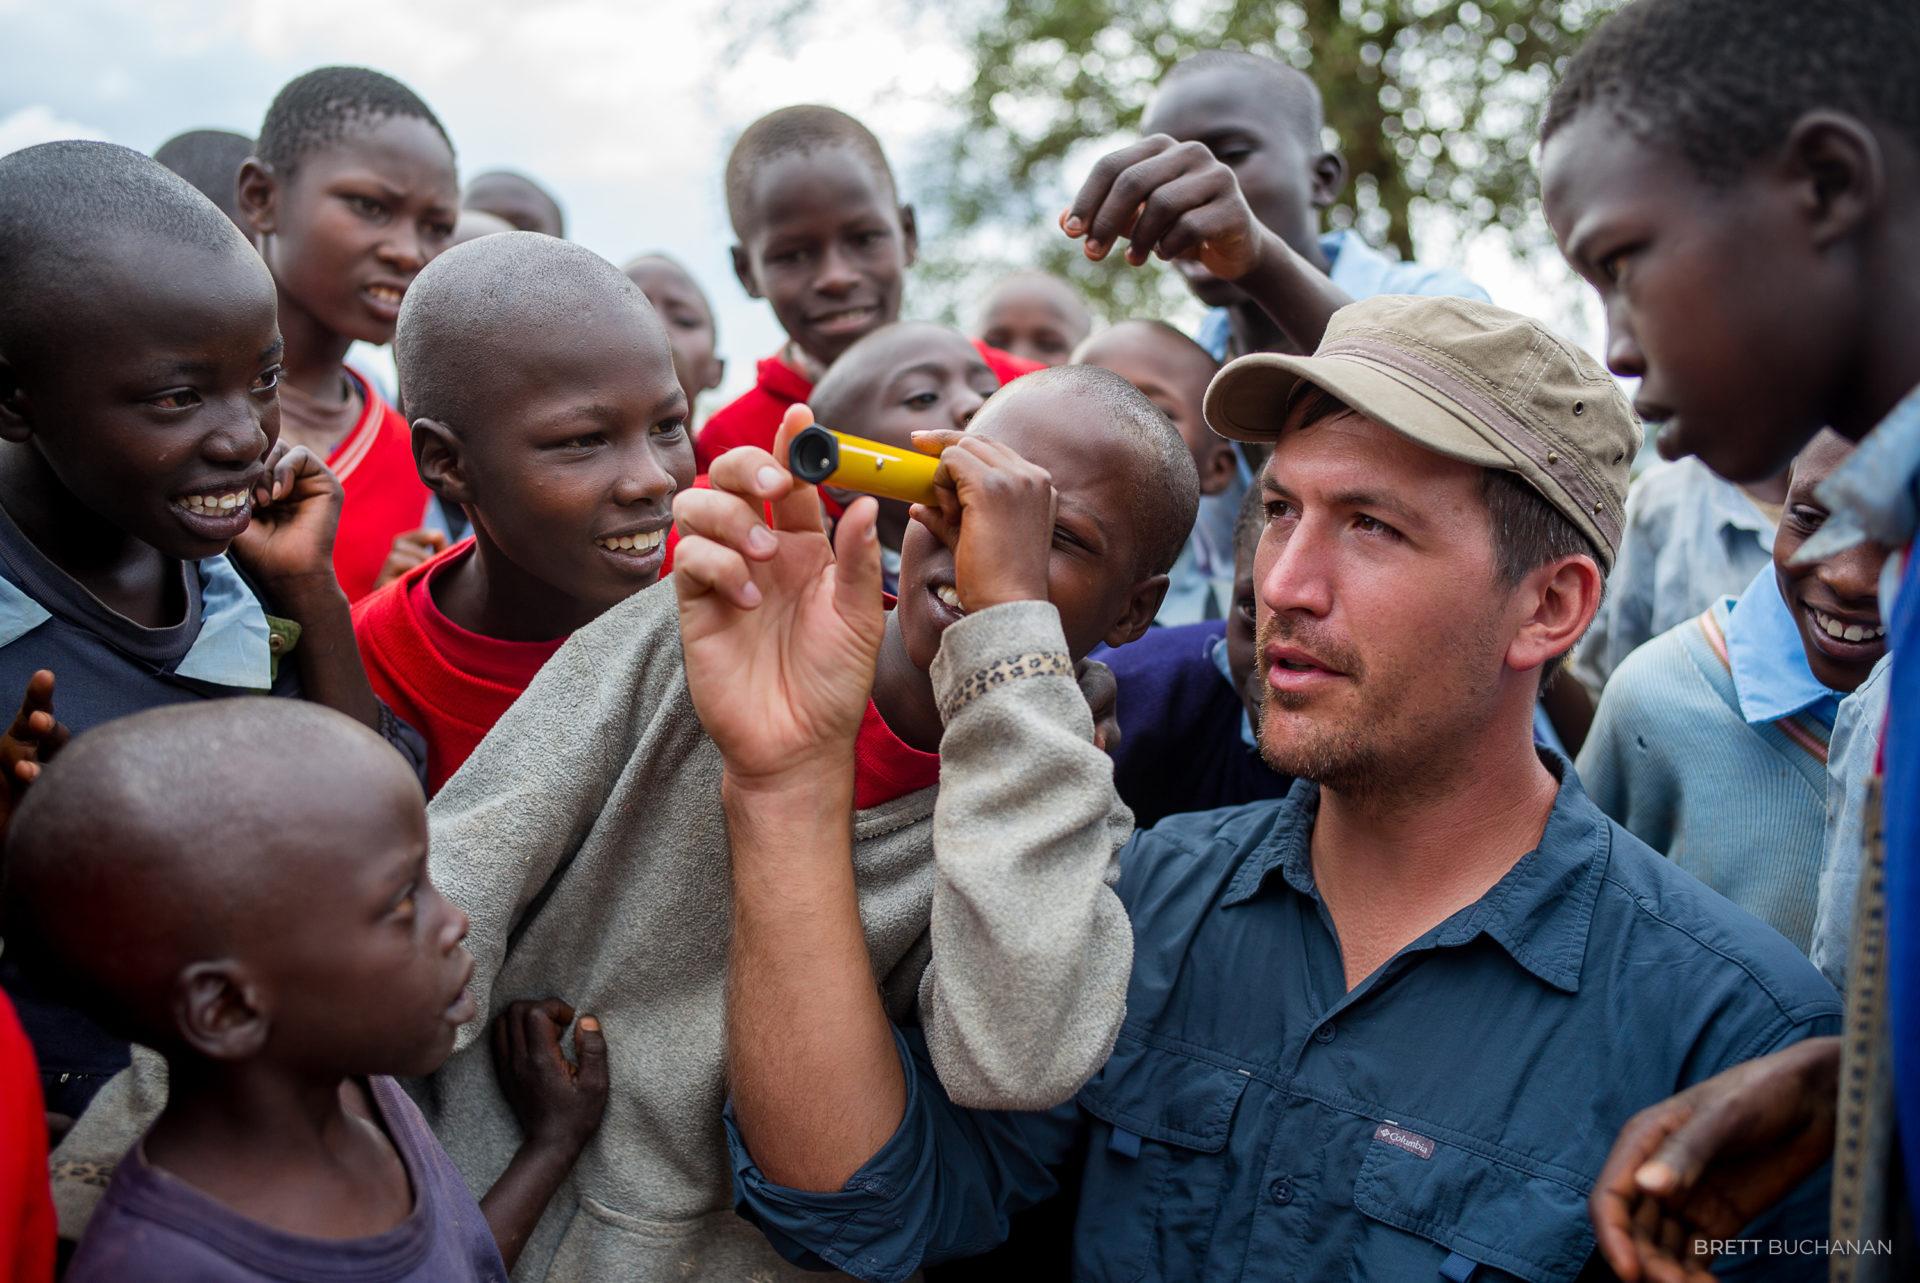 Brett-Buchanan-Kenya-water-development-NGO-22